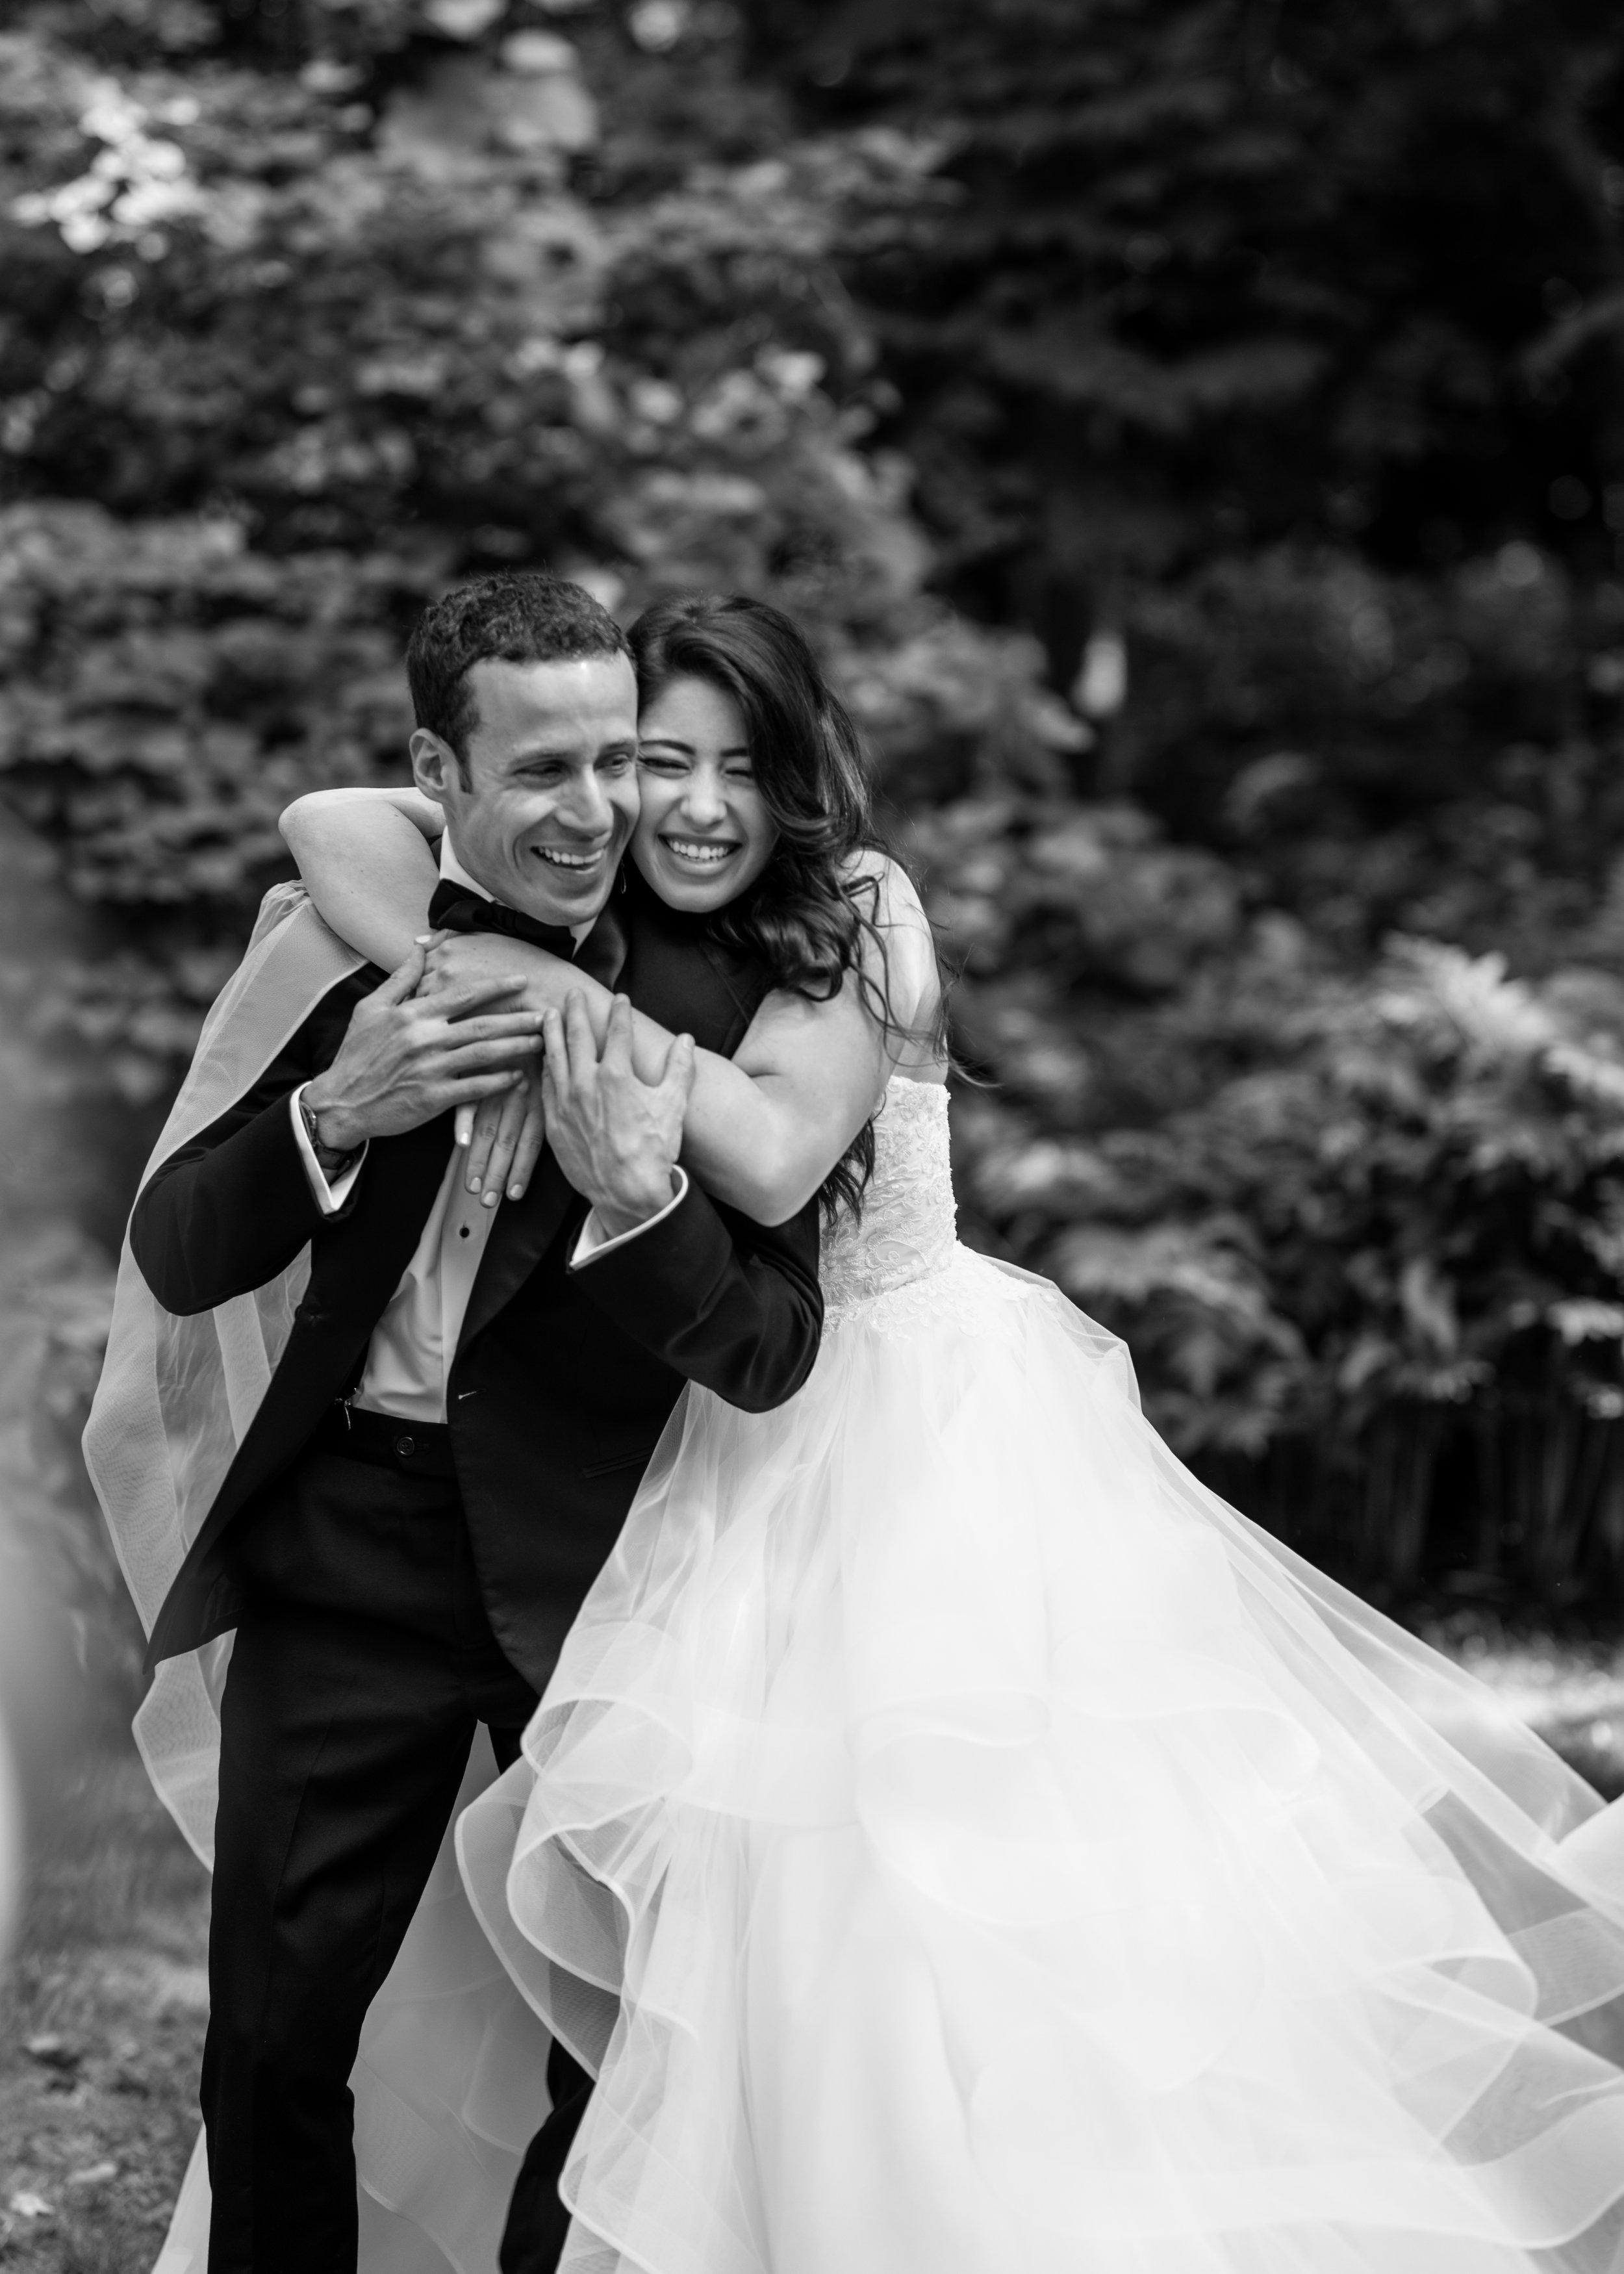 herastudios_wedding_tania_oren_hera_selects-24.jpg